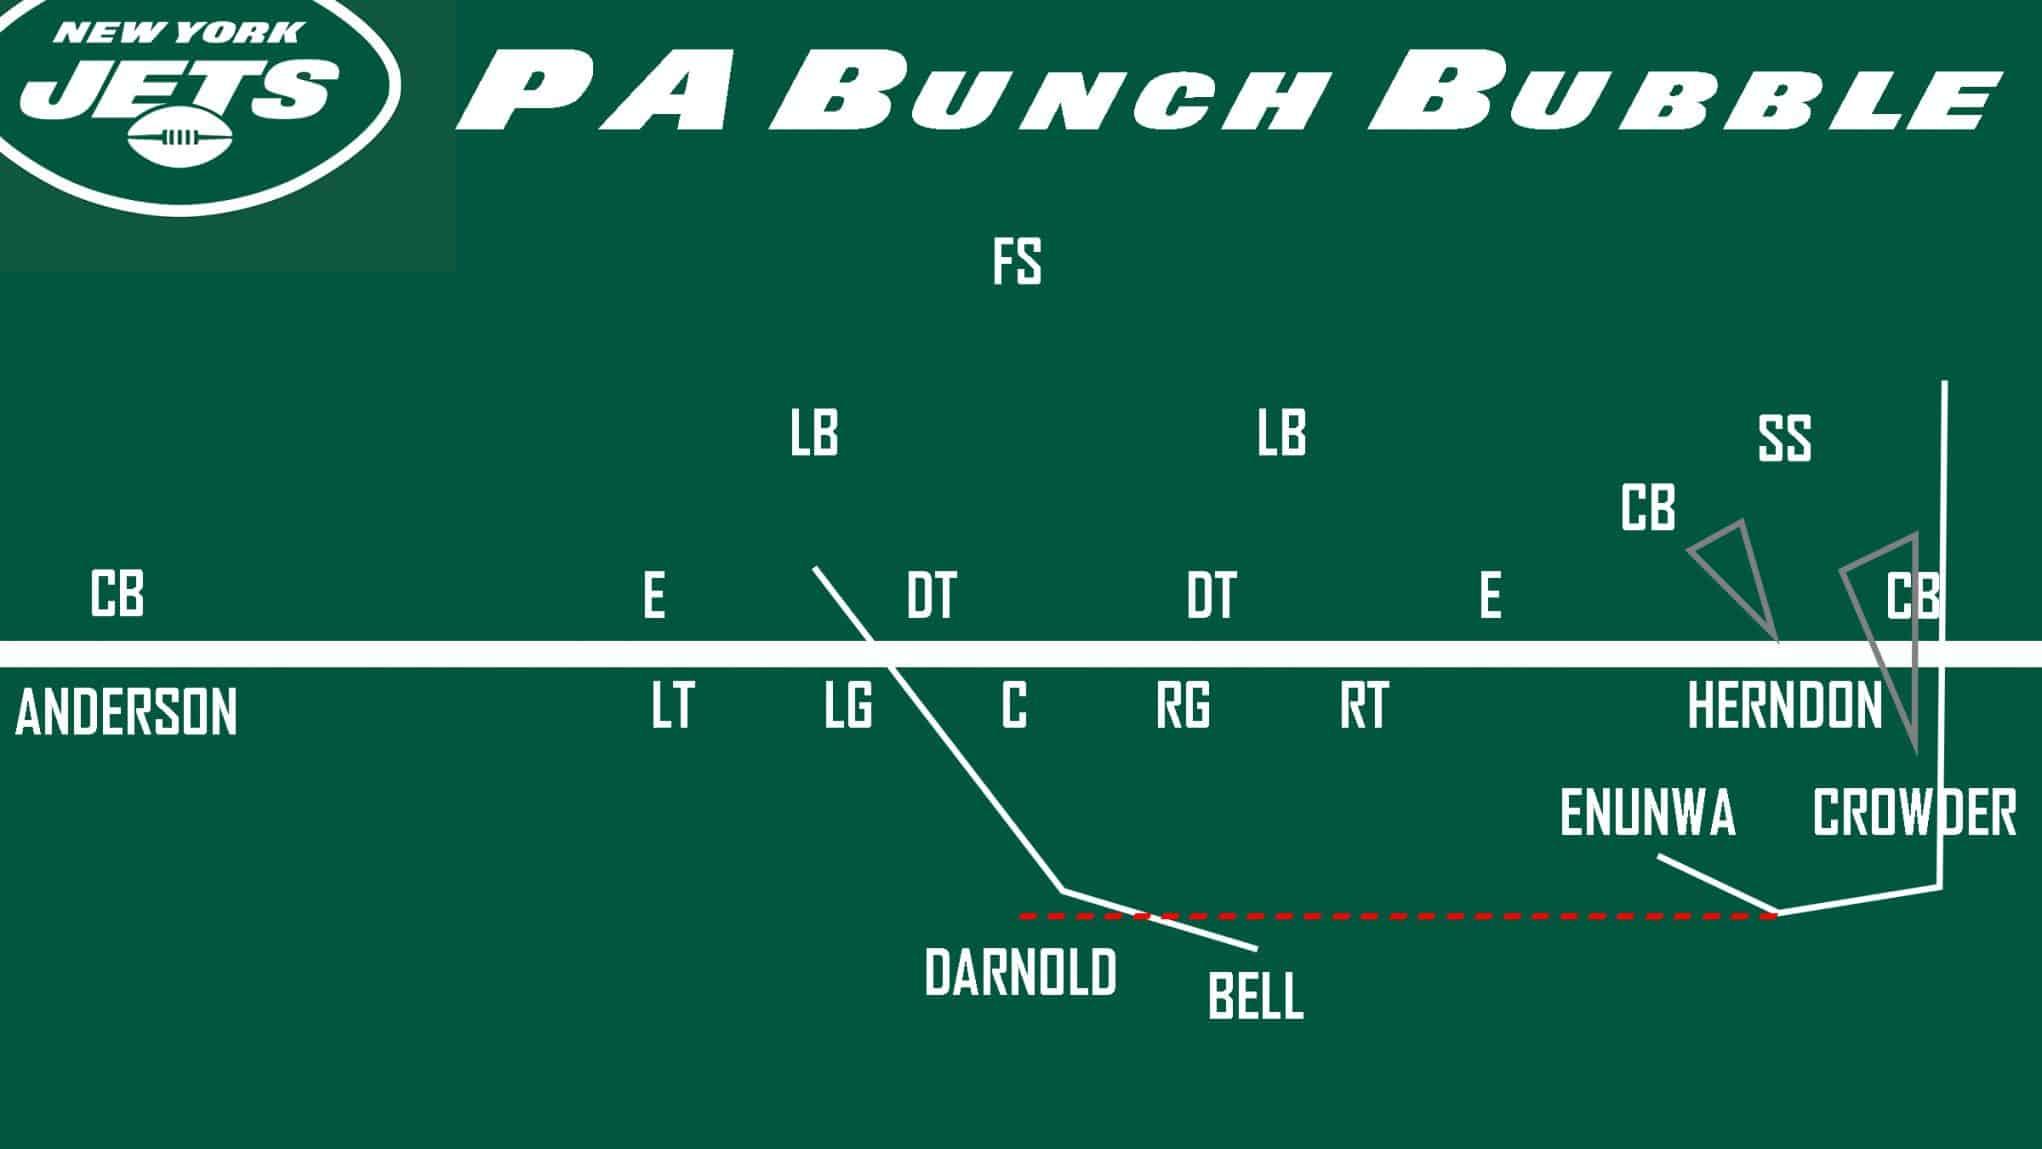 Jets PA Bunch Bubble